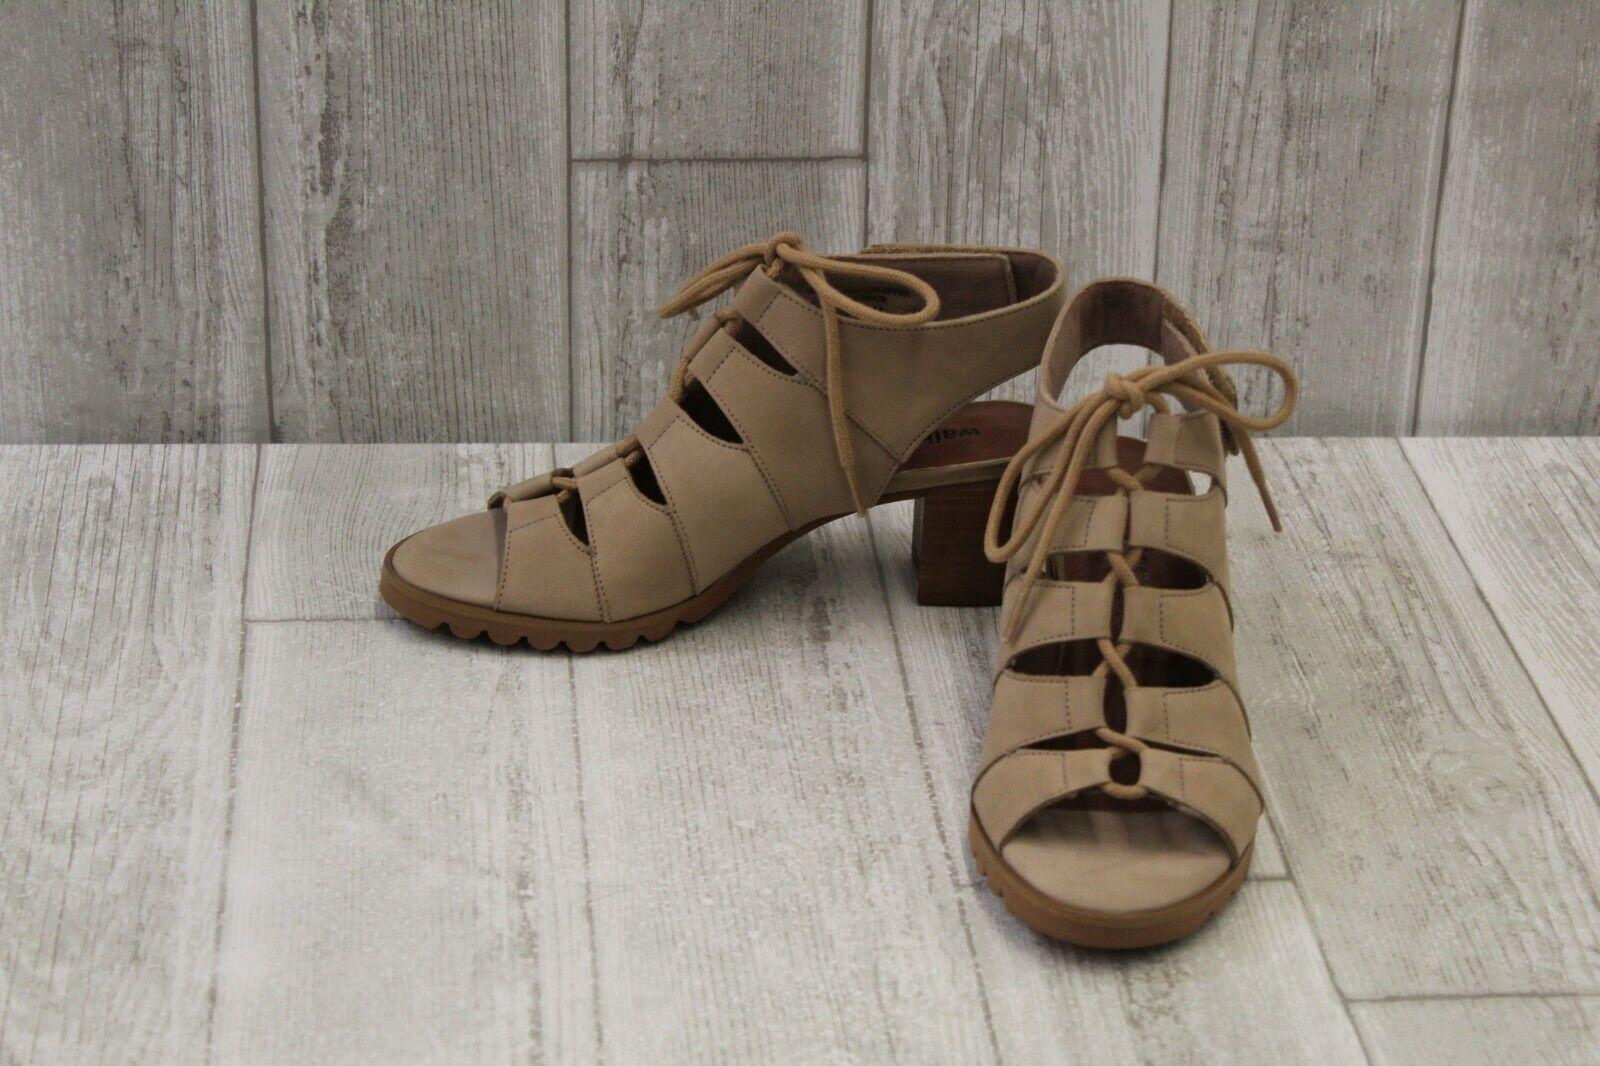 Walking Cradles Women's Nola Sandal - Light Taupe - Size 5.5 M